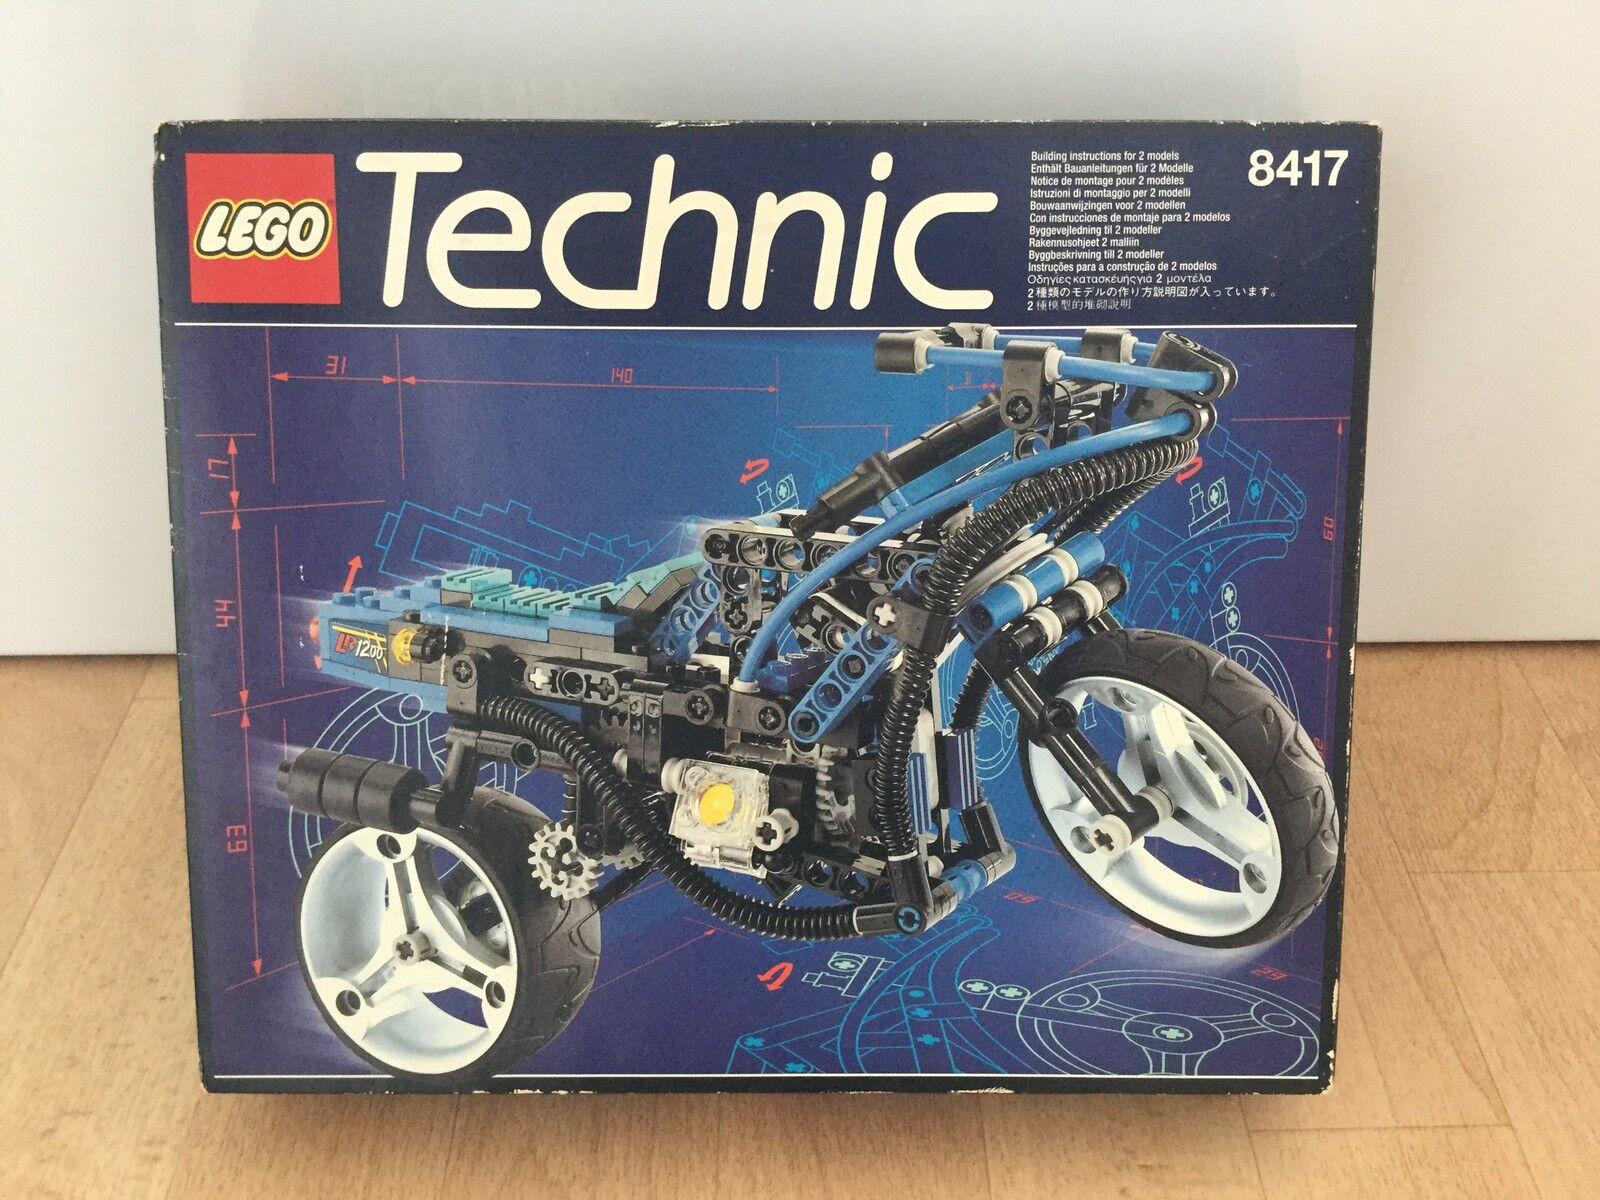 Lego Technic Motorbike 8417 - Rare Set - NEW